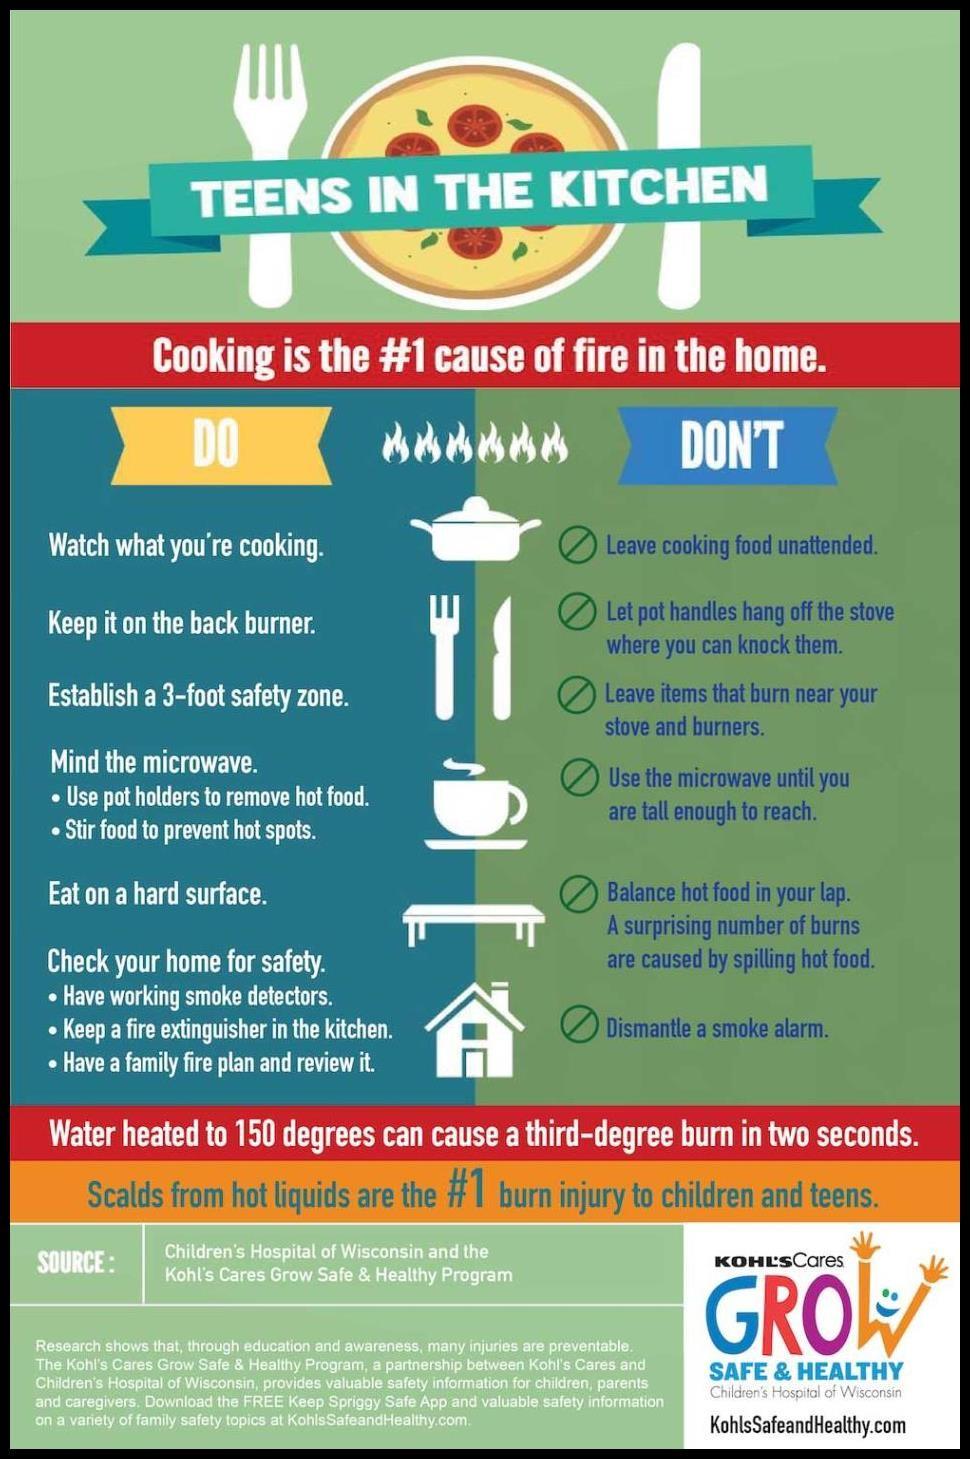 10 Health And Safety Hazards In The Kitchen - RLZY HAROLD LAWSON\'S BLOG